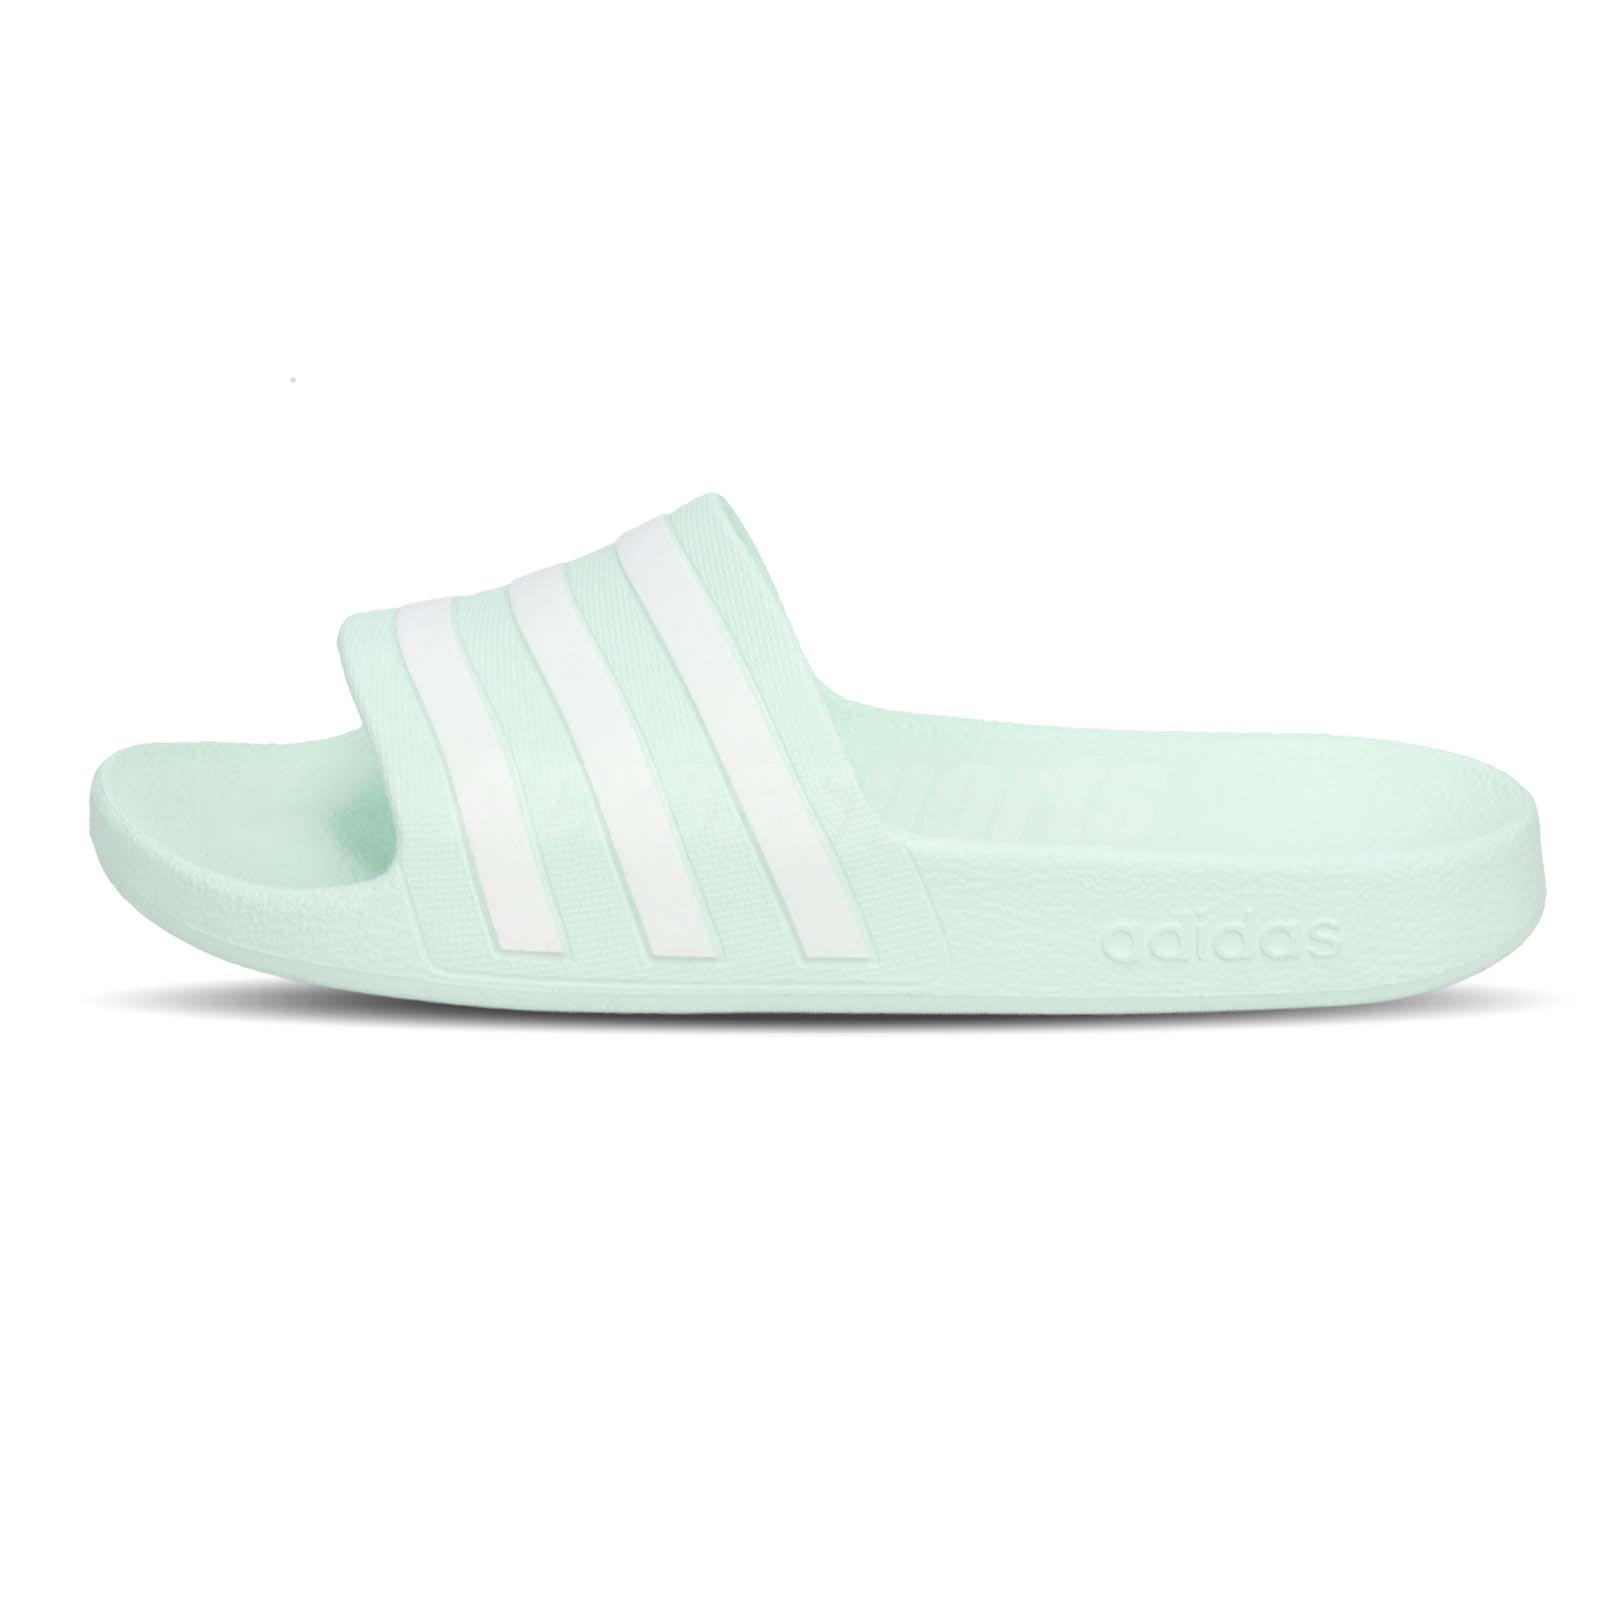 8ef75597cd10 adidas Adilette Aqua Mint Green White Mens Womens Sandal Slipper ...